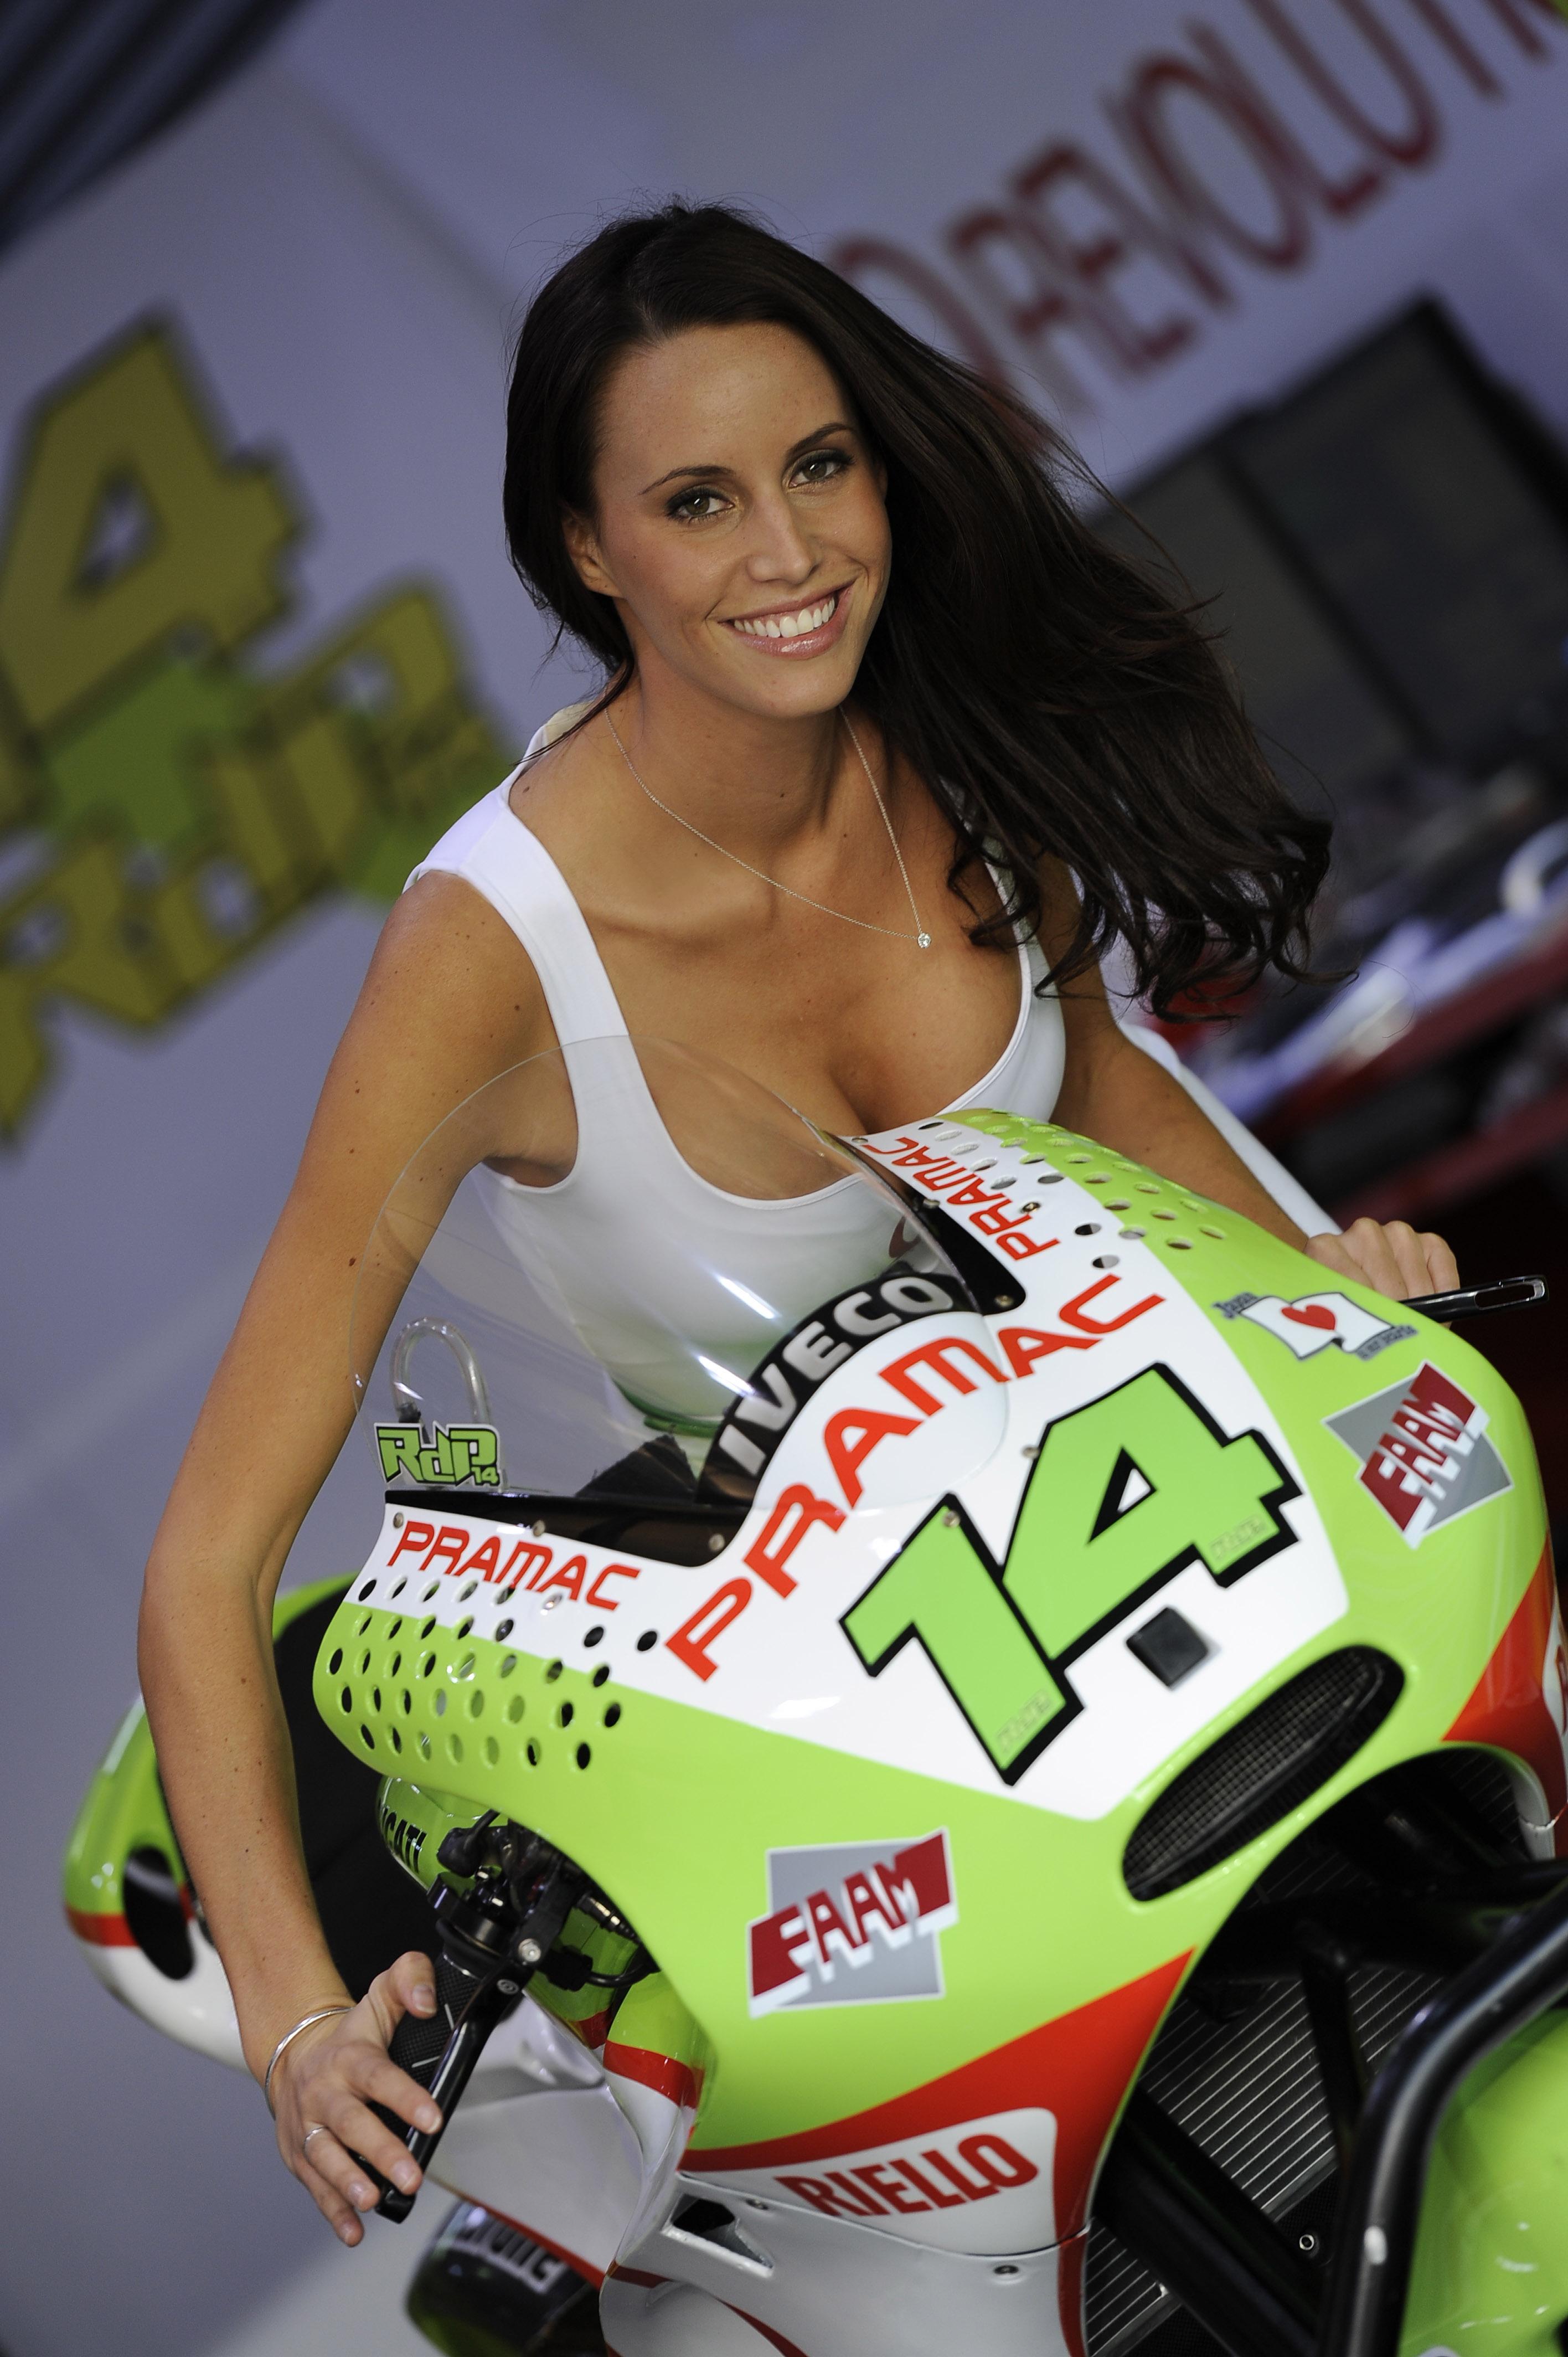 MotoGP Grid Girl Gallery: Sachsenring 2011 | Visordown